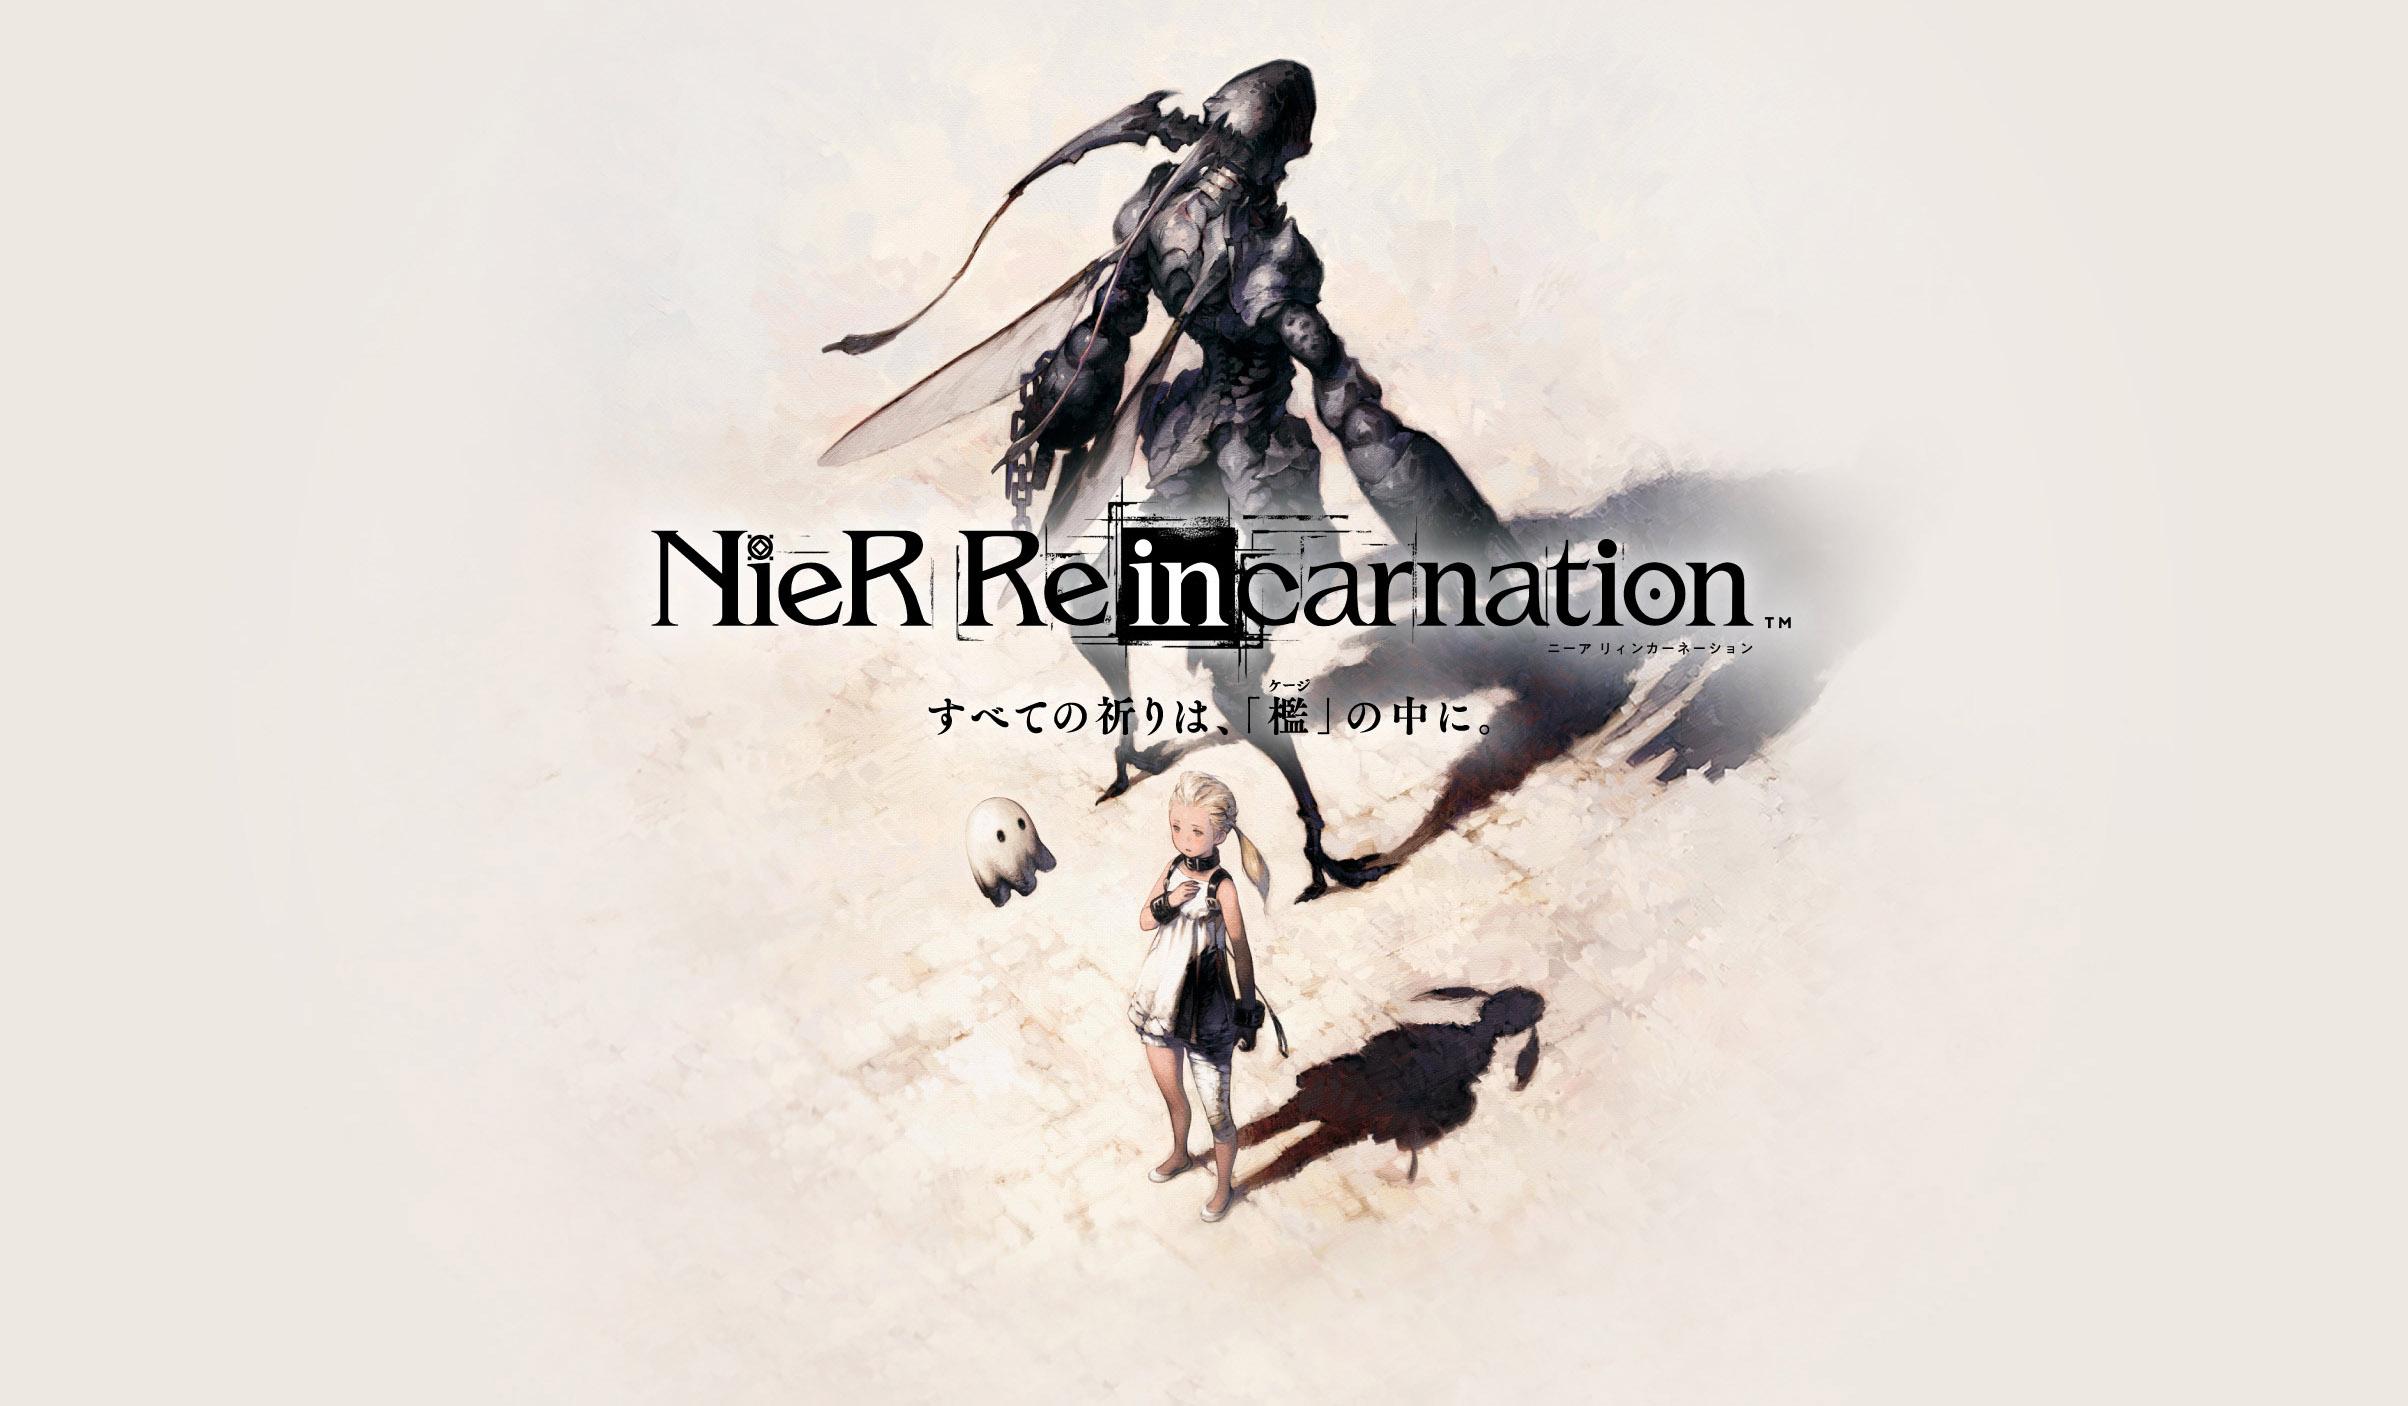 《尼尔:Re[in]carnation》新章节PV公布